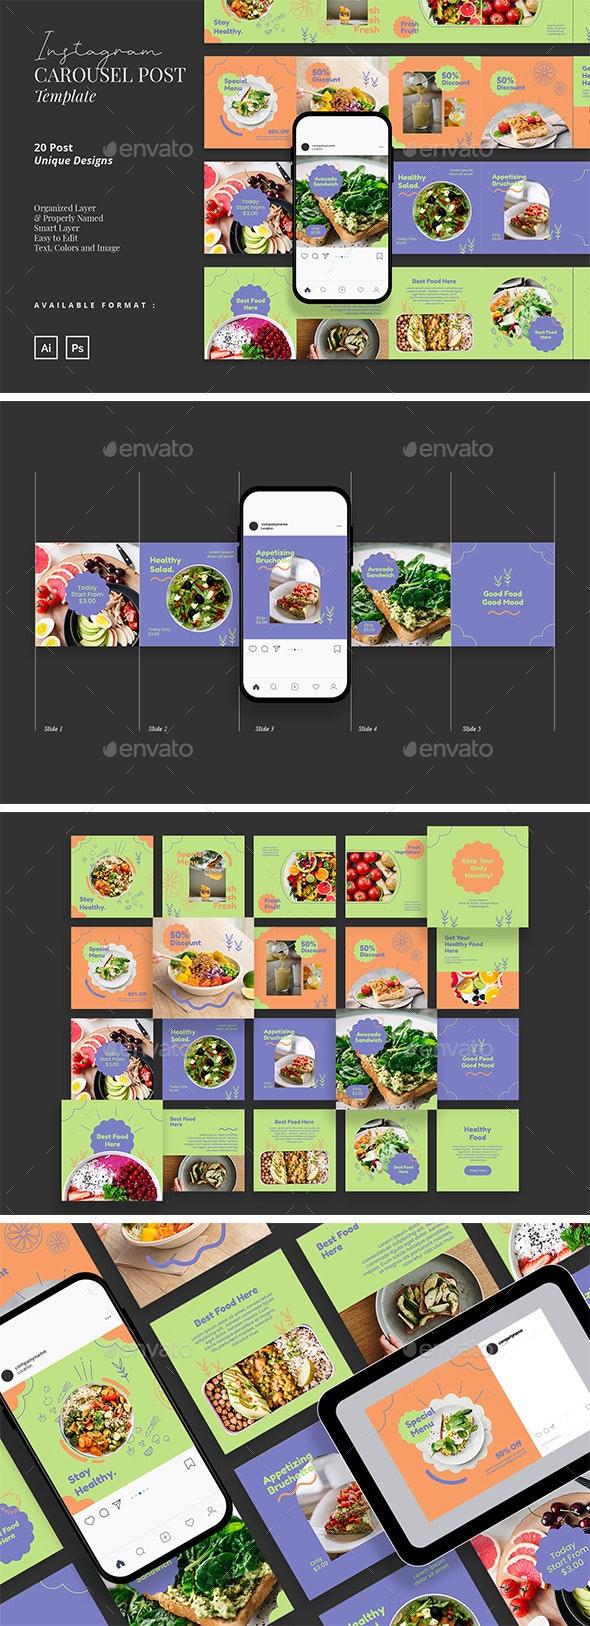 Healthy Food Carousel Instagram Post Template - Social Media Web Elements